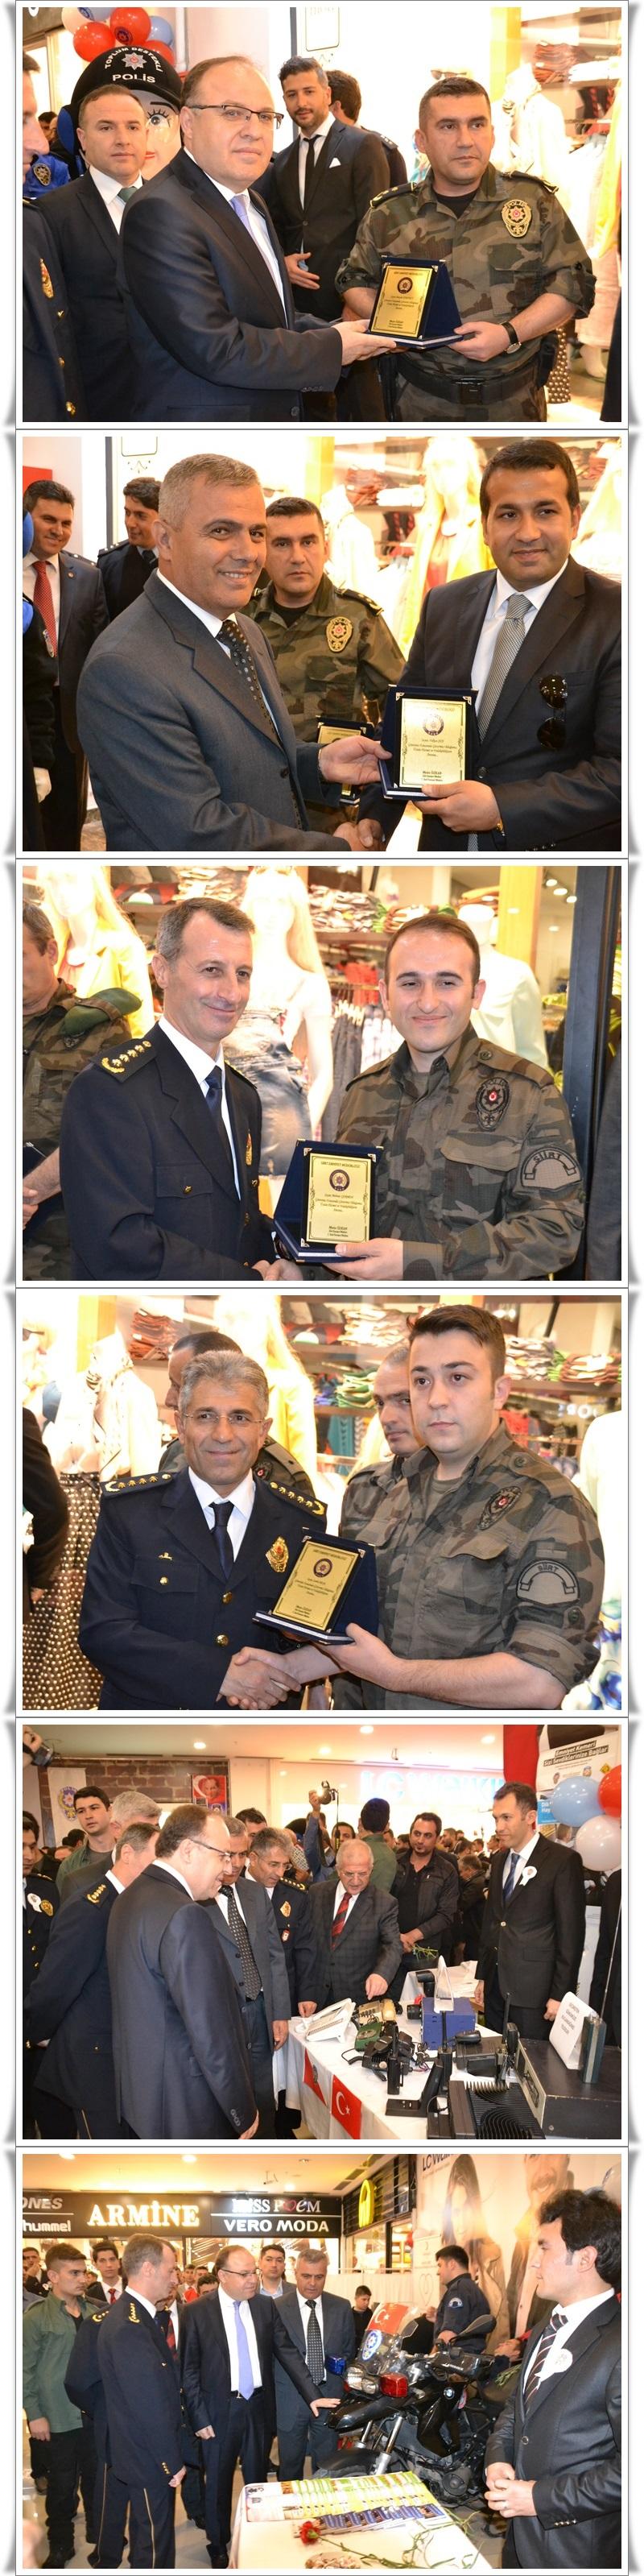 Polis Sergisi A+ğ¦-ld¦- (8)-vert